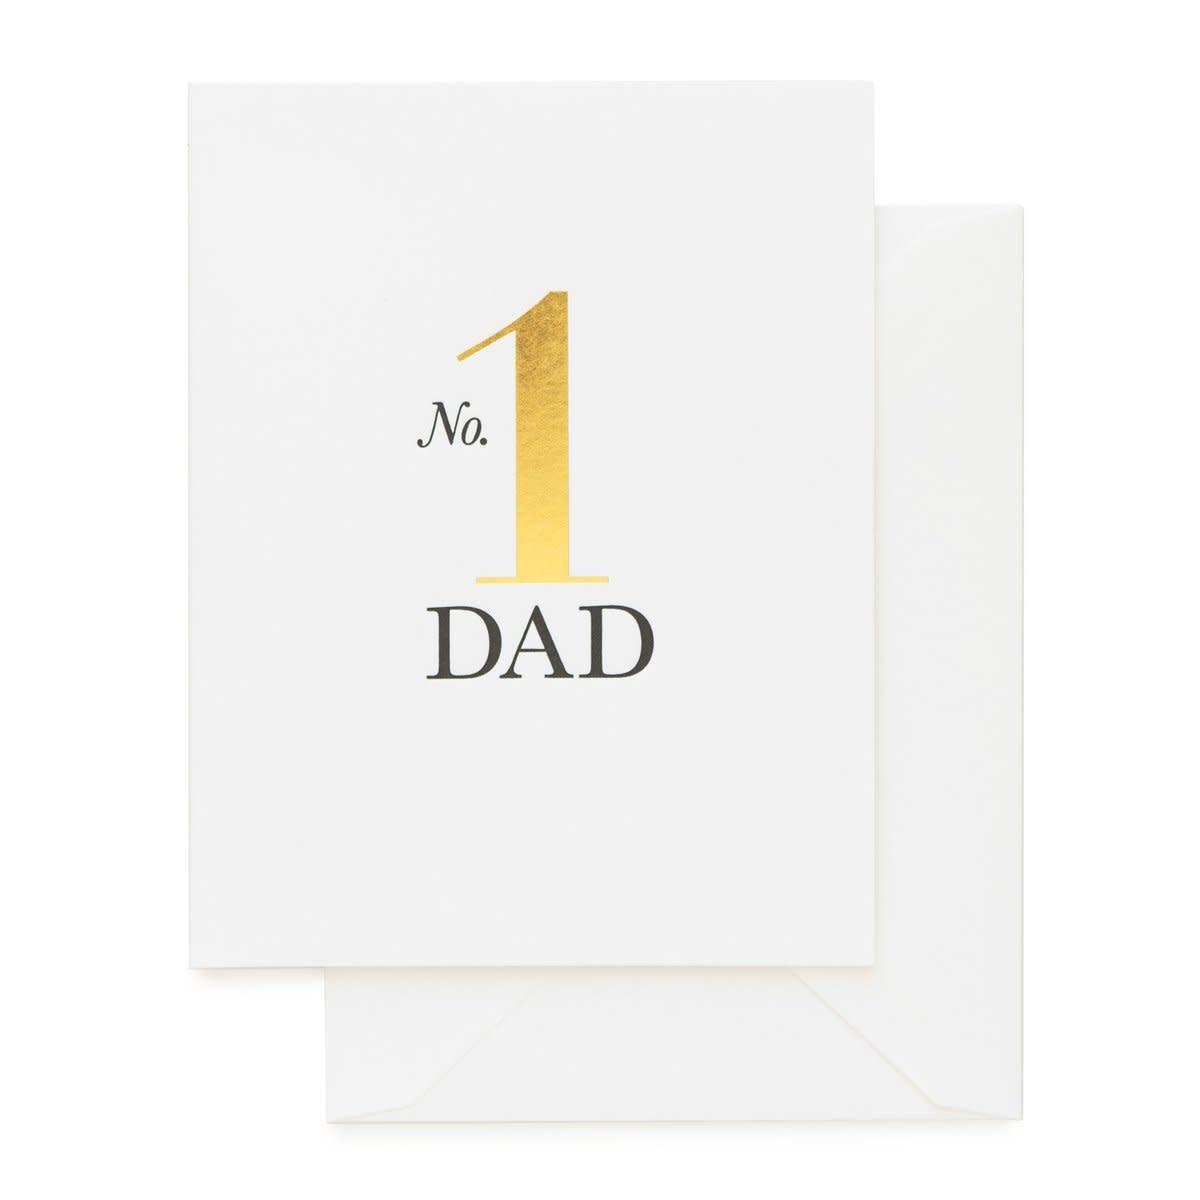 SUGAR PAPER No. 1 Dad Gold Card